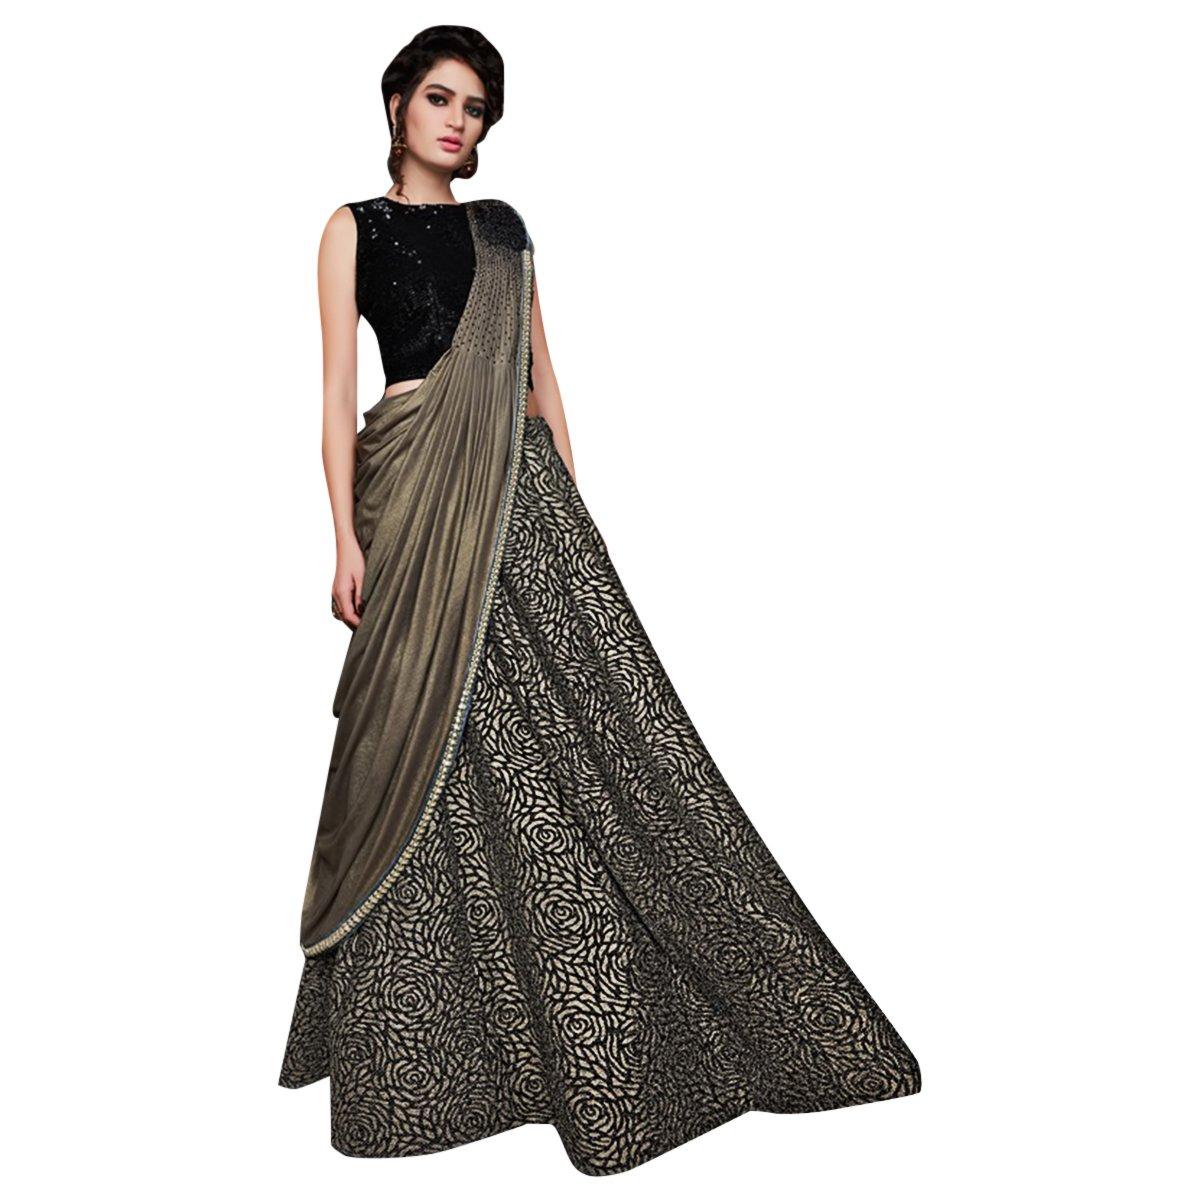 Women Lehenga Choli Dupatta Bollywood Ceremony Bridal Wedding Women Blouse party wear Collection 594 2